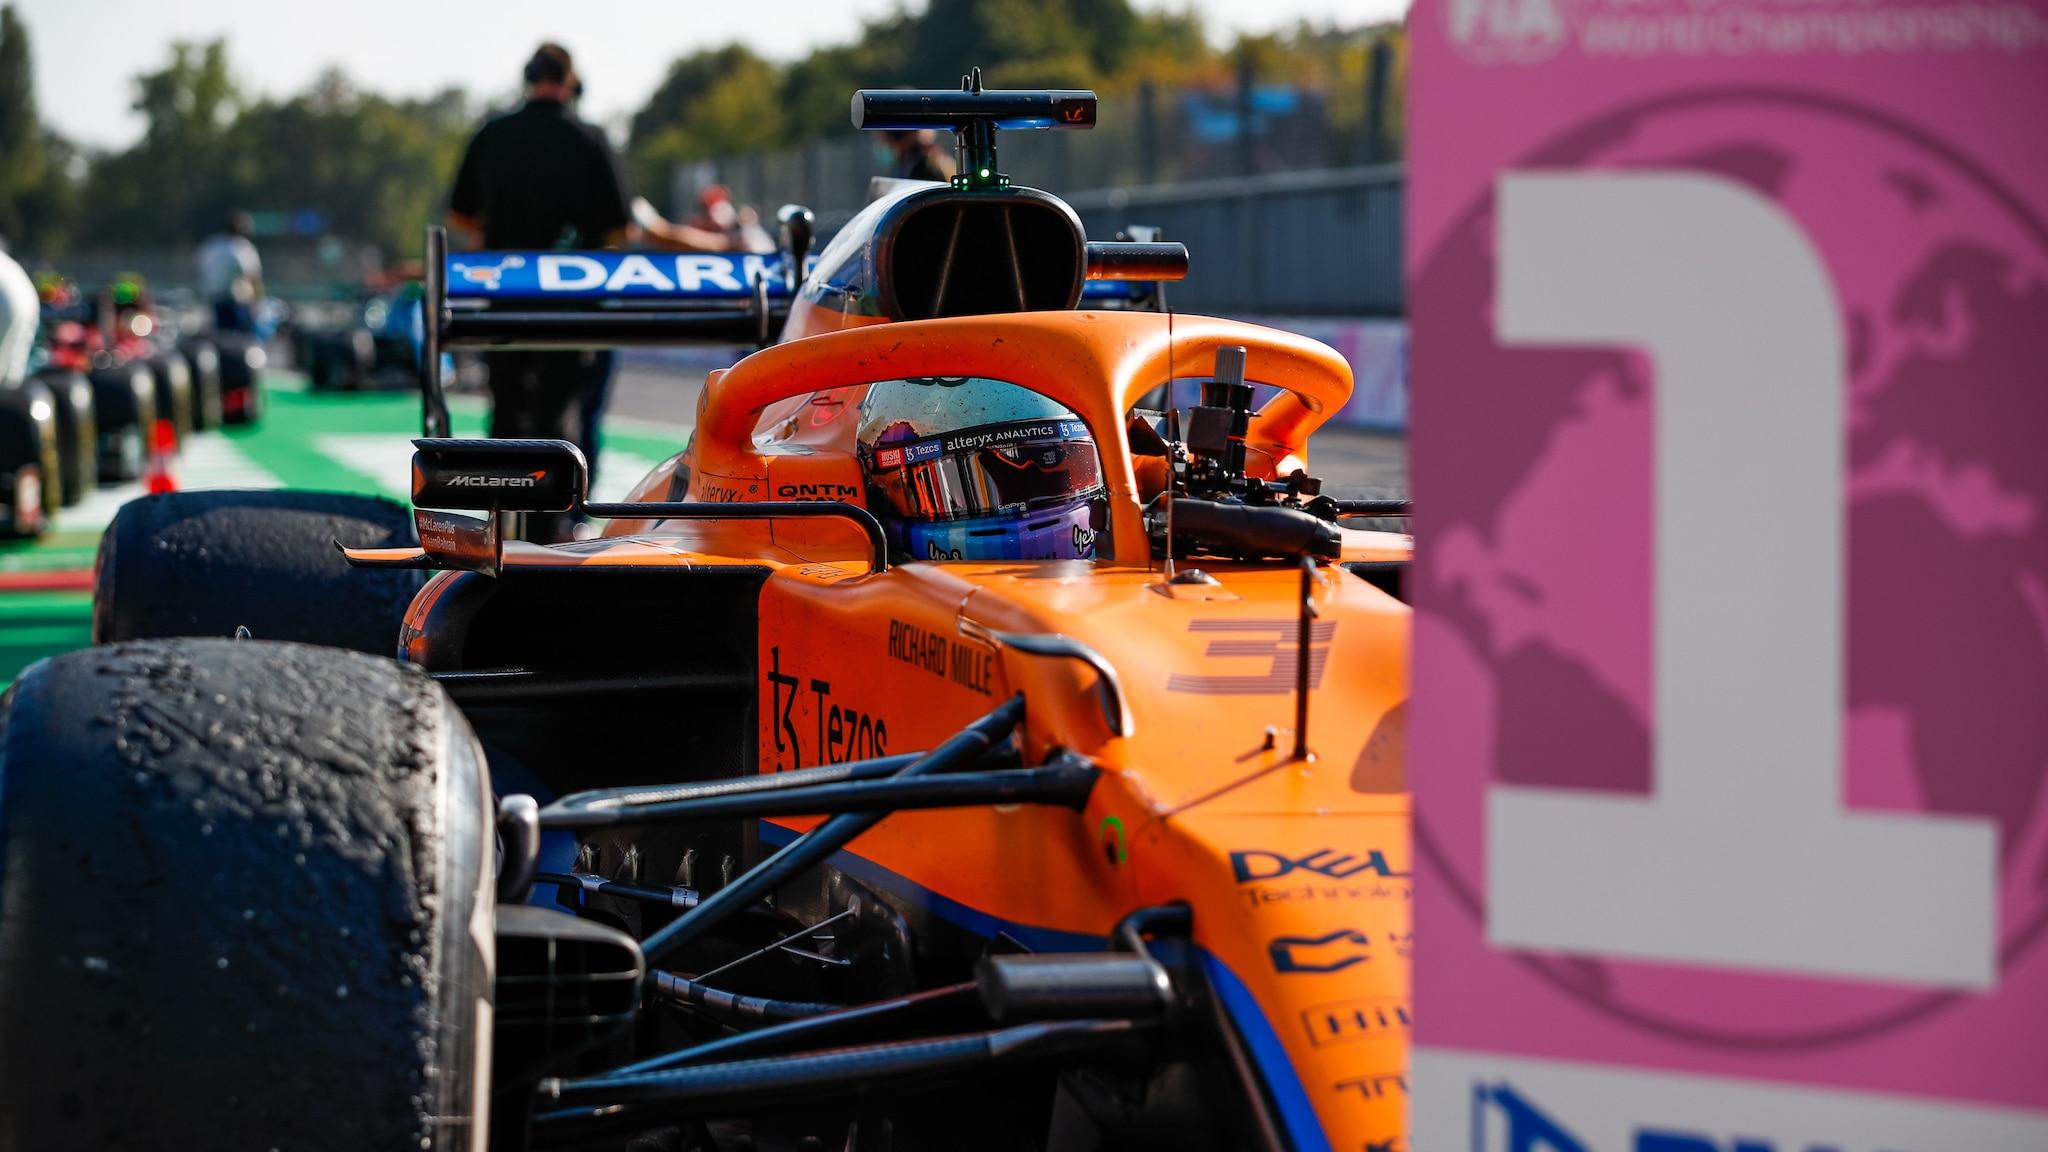 Formel 1 - Seidl: McLaren will regelmäßig siegen